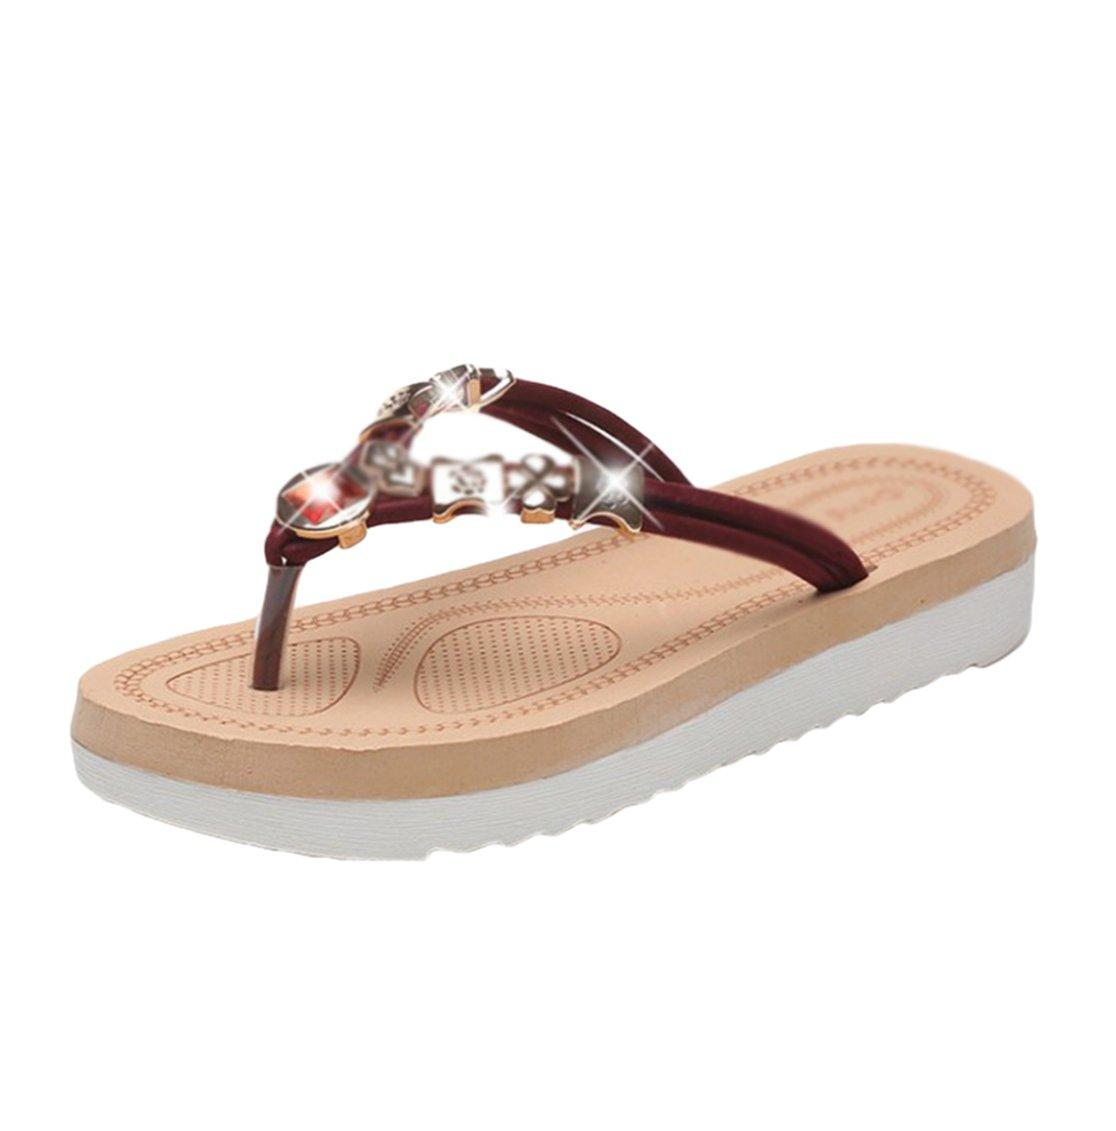 Sentao Frauen Sommer Bouml;hmen Rhinestone flip flop Sandalen Clip Toe Rouml;mische Strand Hausschuhe  Asia35 (L?nge:22.5cm)|Weinrot